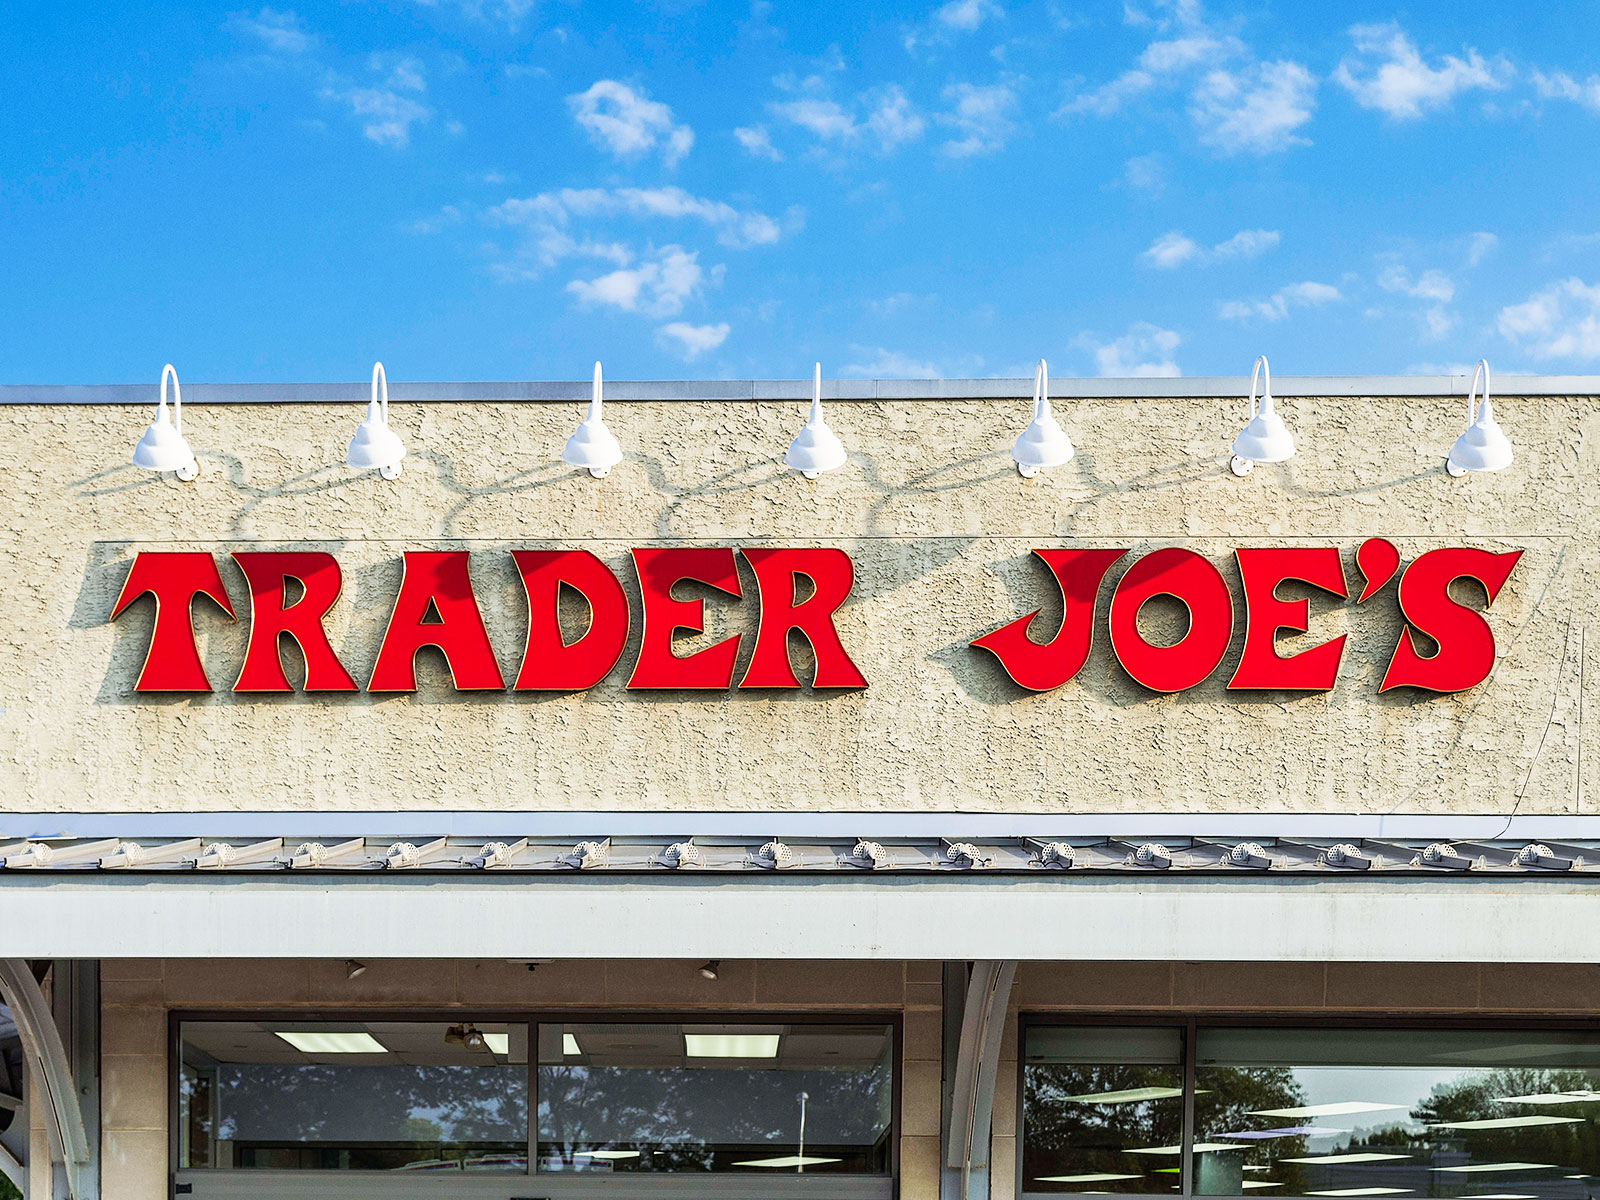 trader joes jingle jangle